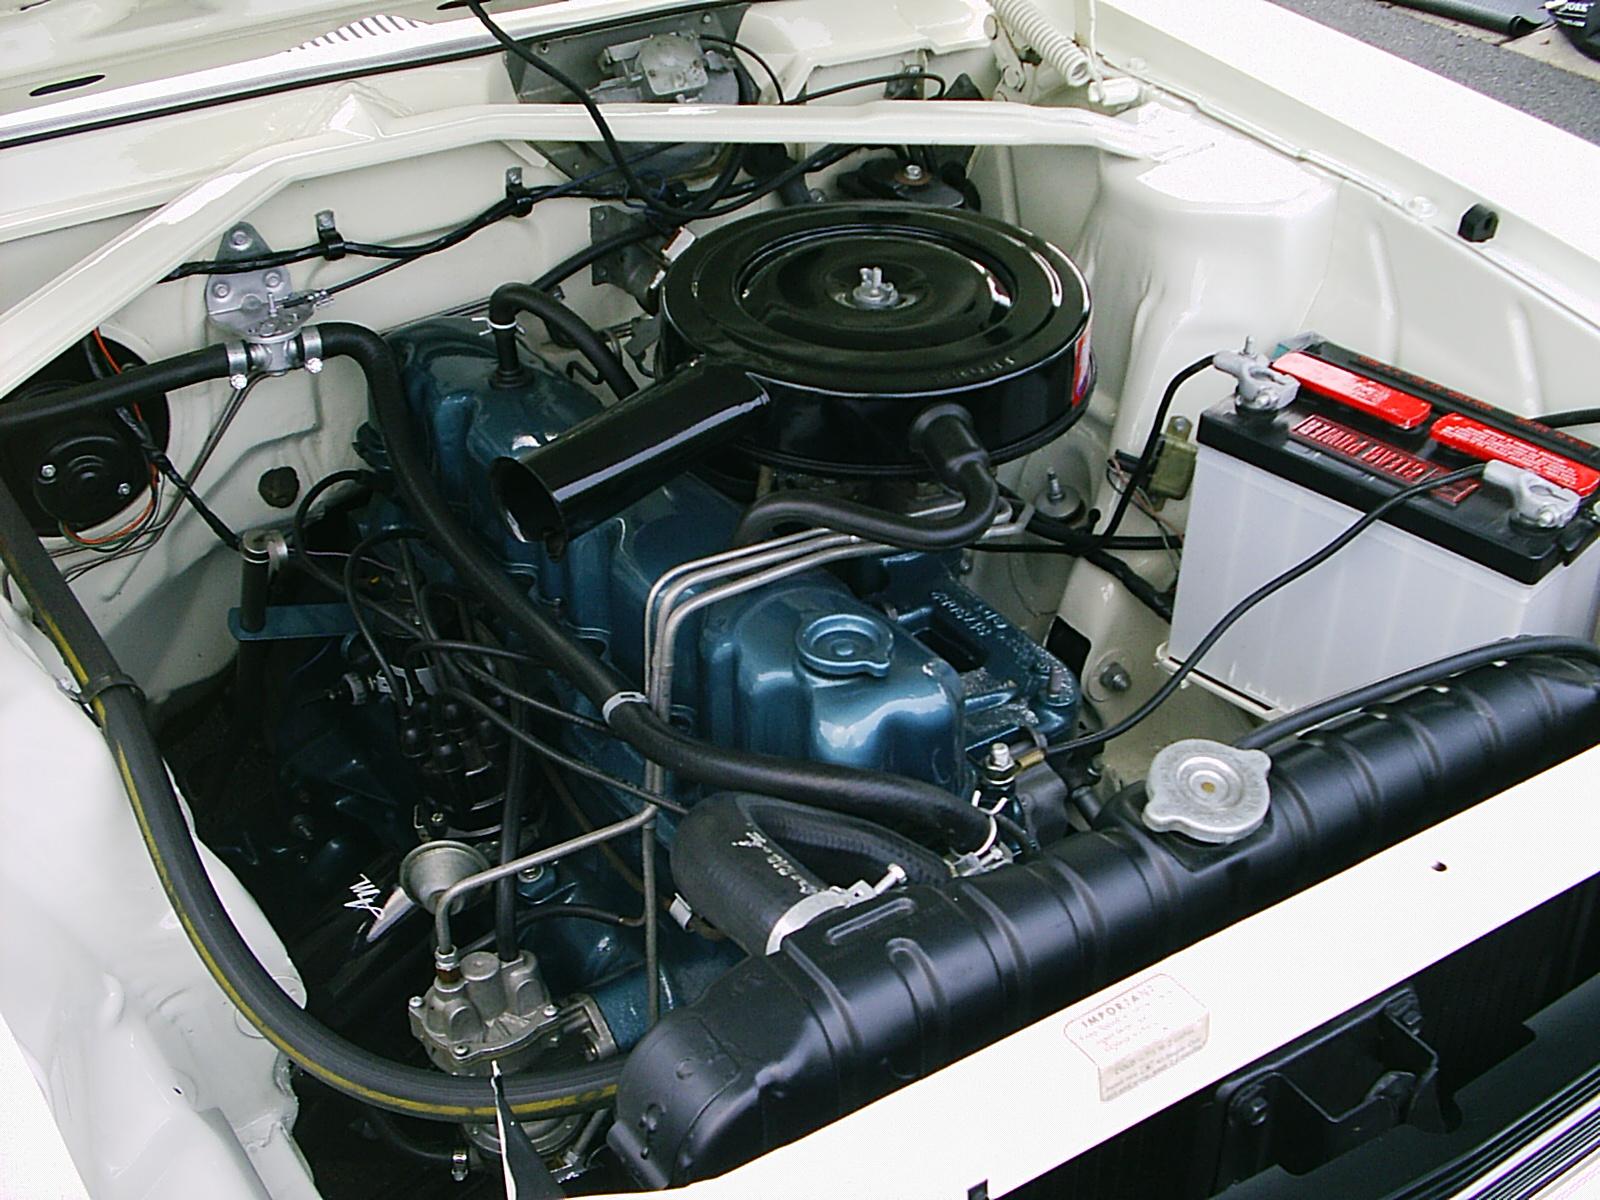 file 1968 rambler american wagon engine mdshow jpg jeep yj engine belt diagram